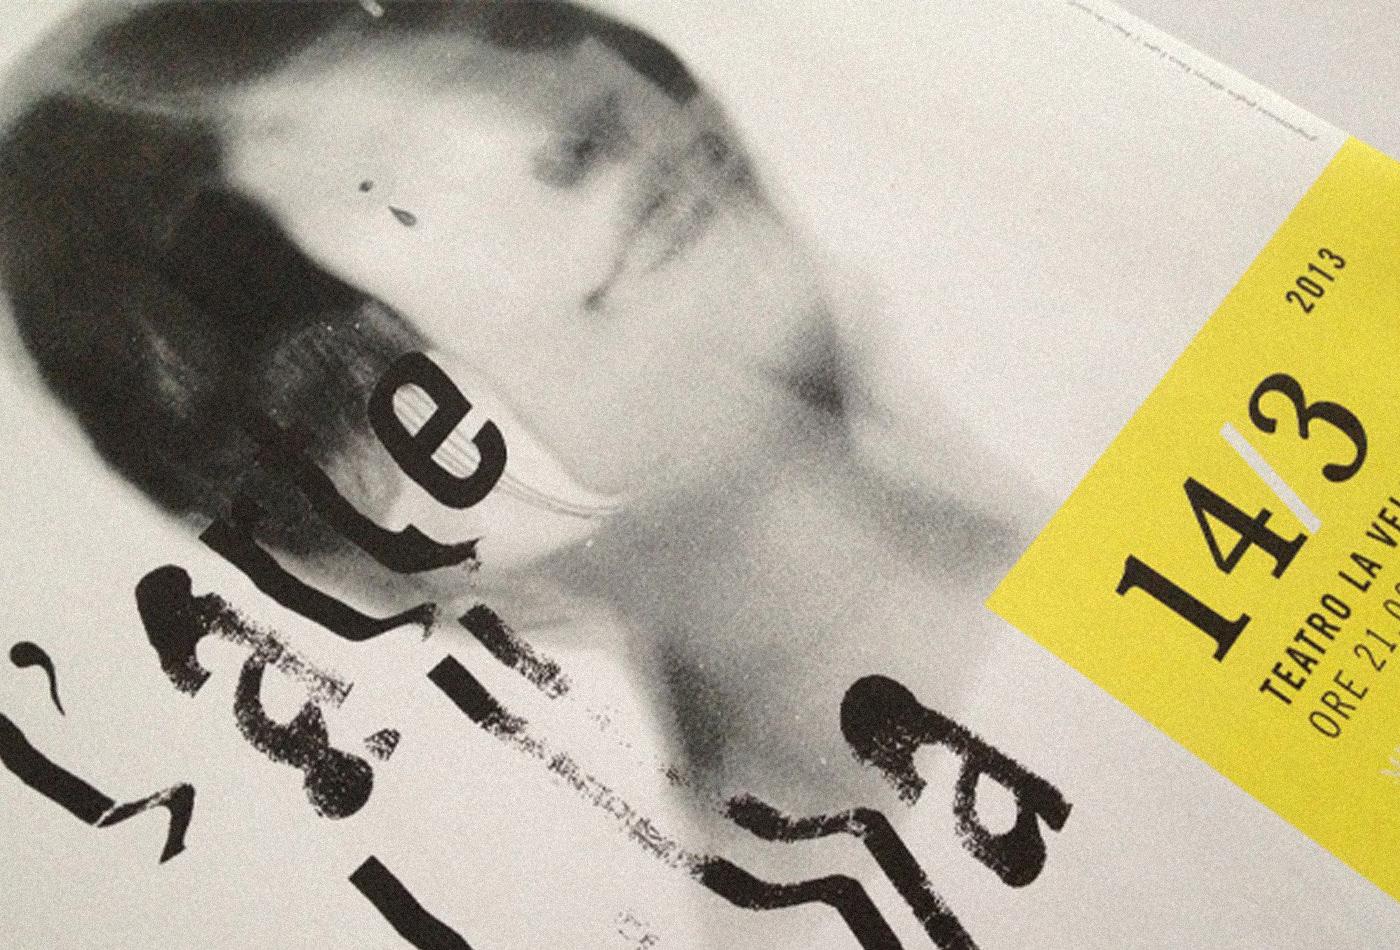 02-childhood-theatre-poster-manifesto-illustration-vacaliebres